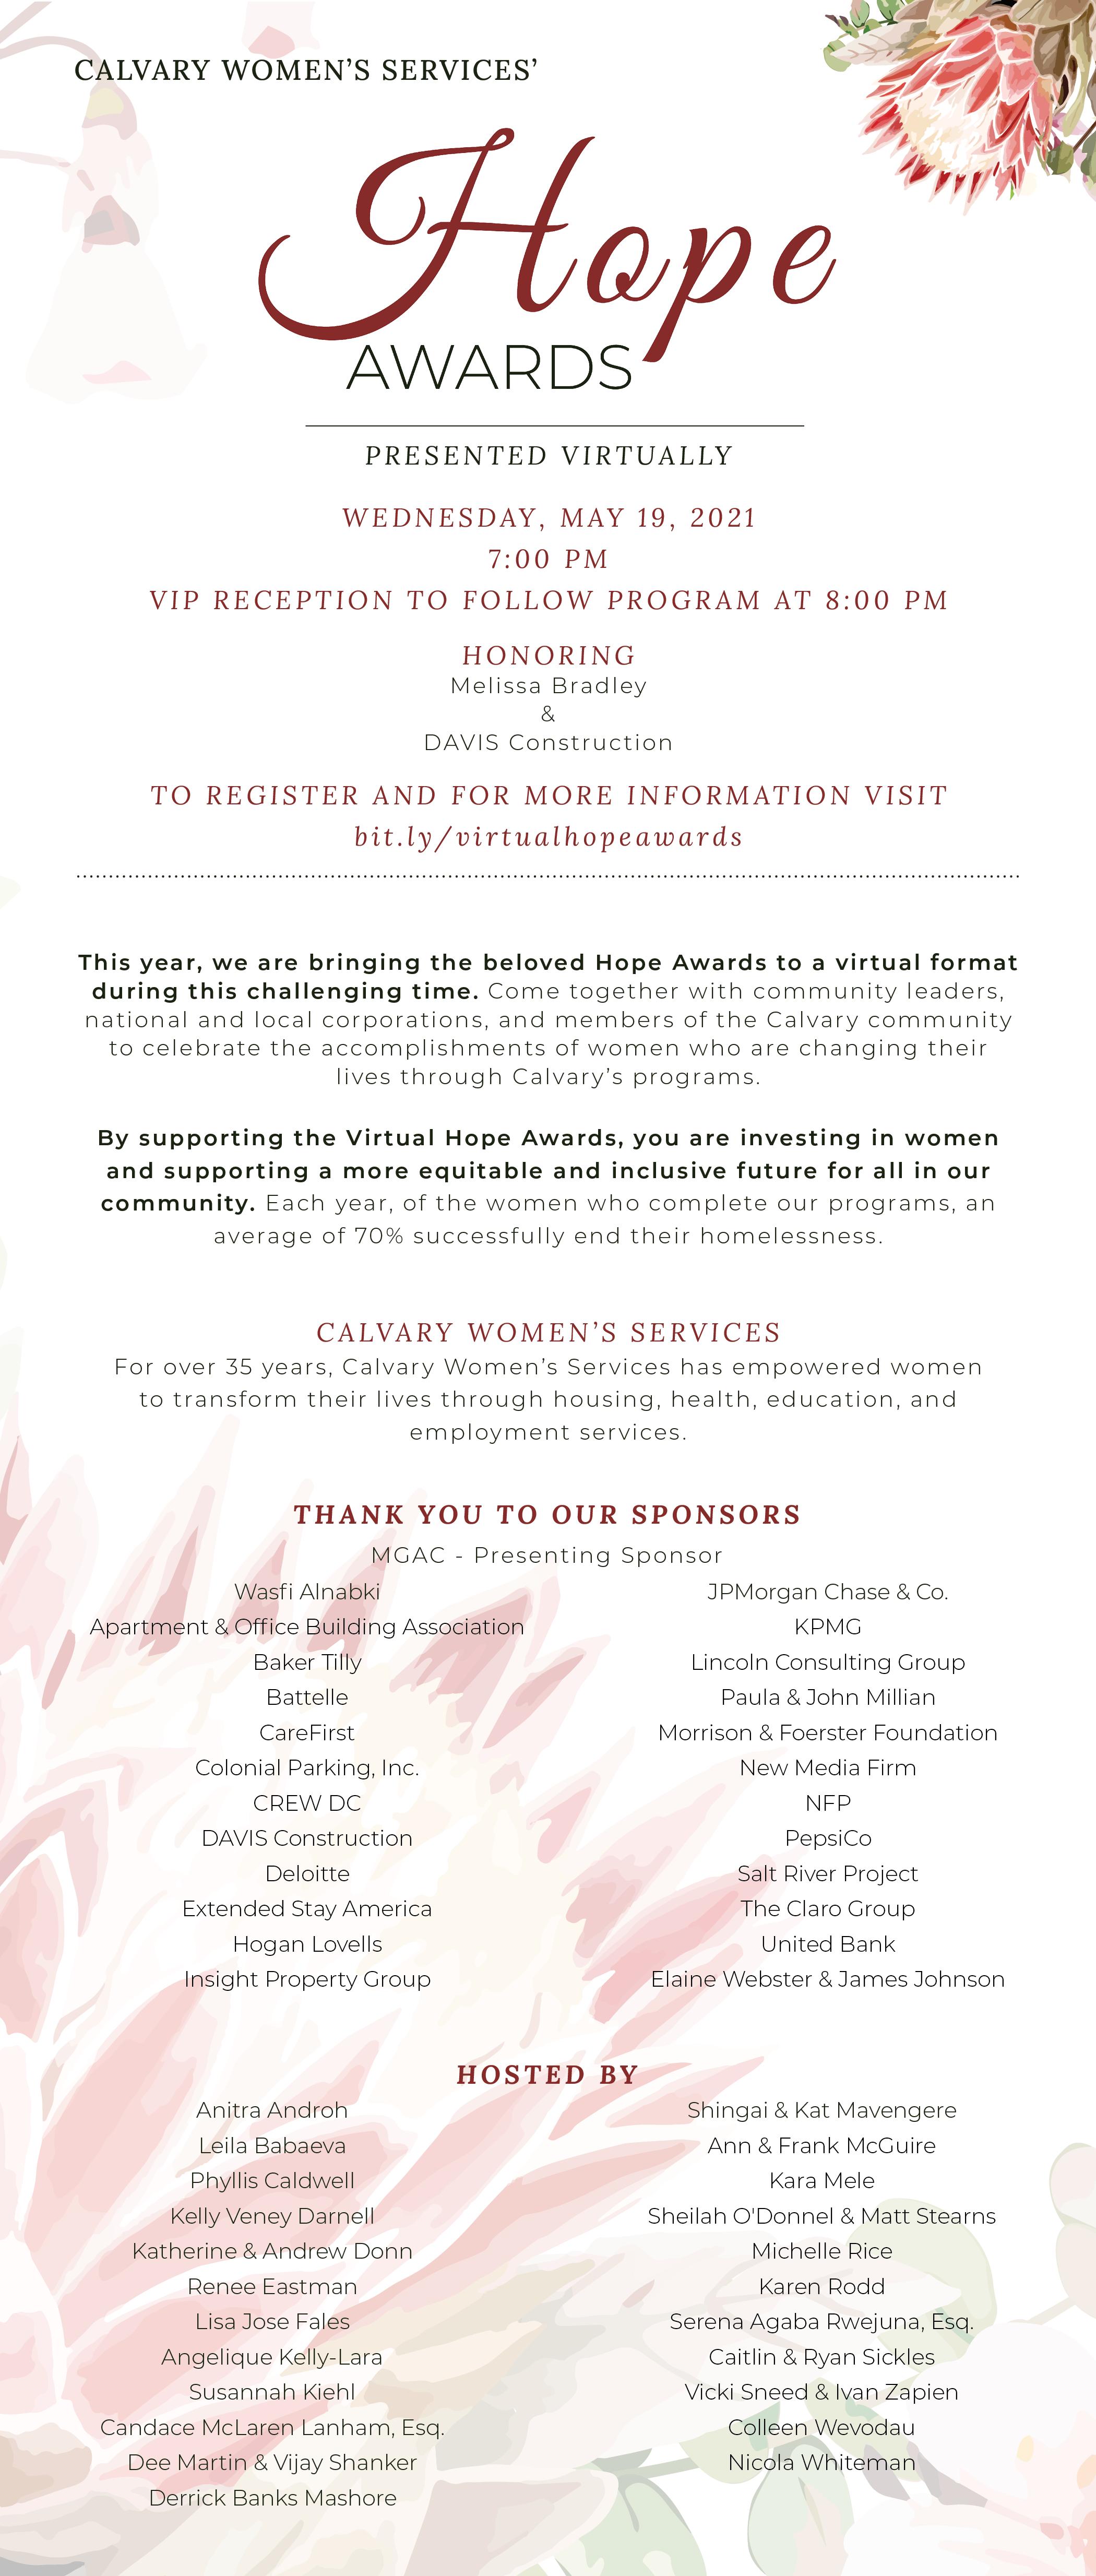 Image of Hope Awards Invitation, details found at link below